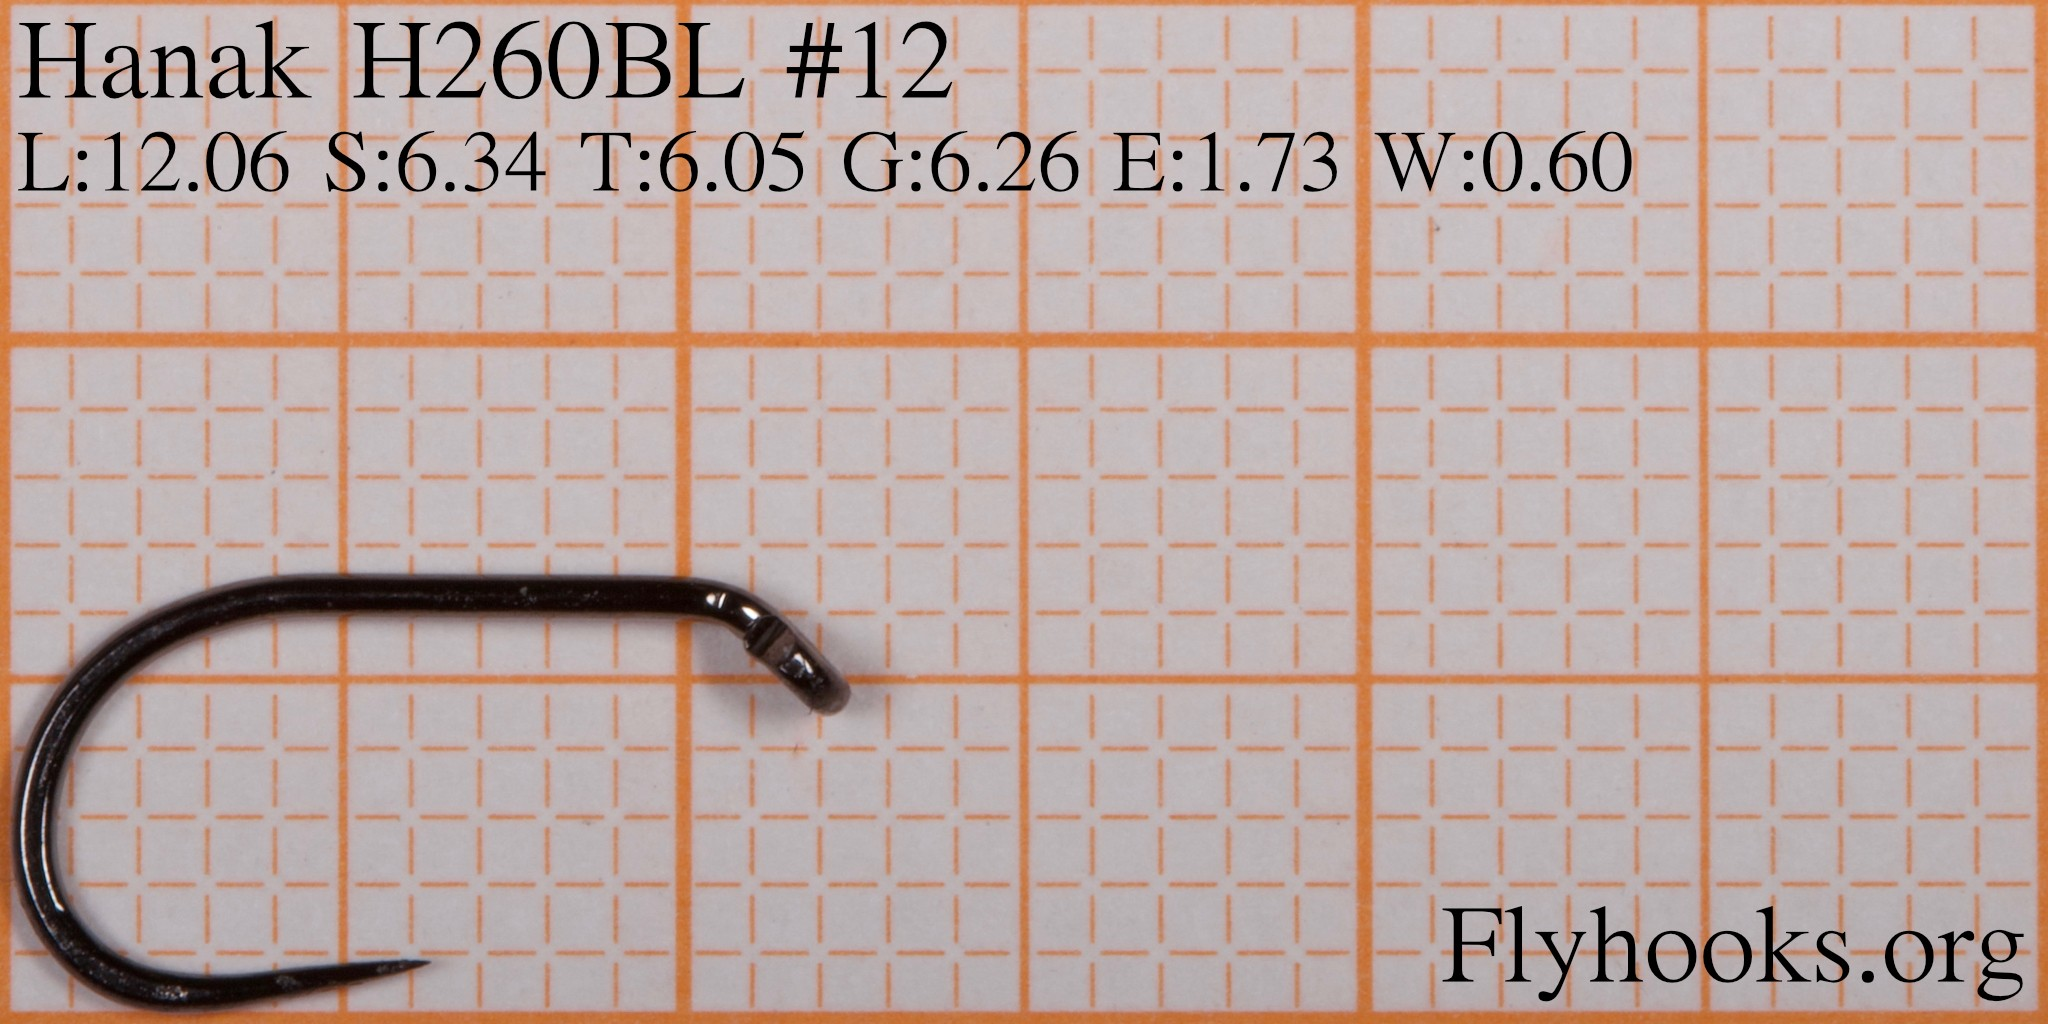 flyhooks.hanak.h260.12-grid-1024-1024.jp